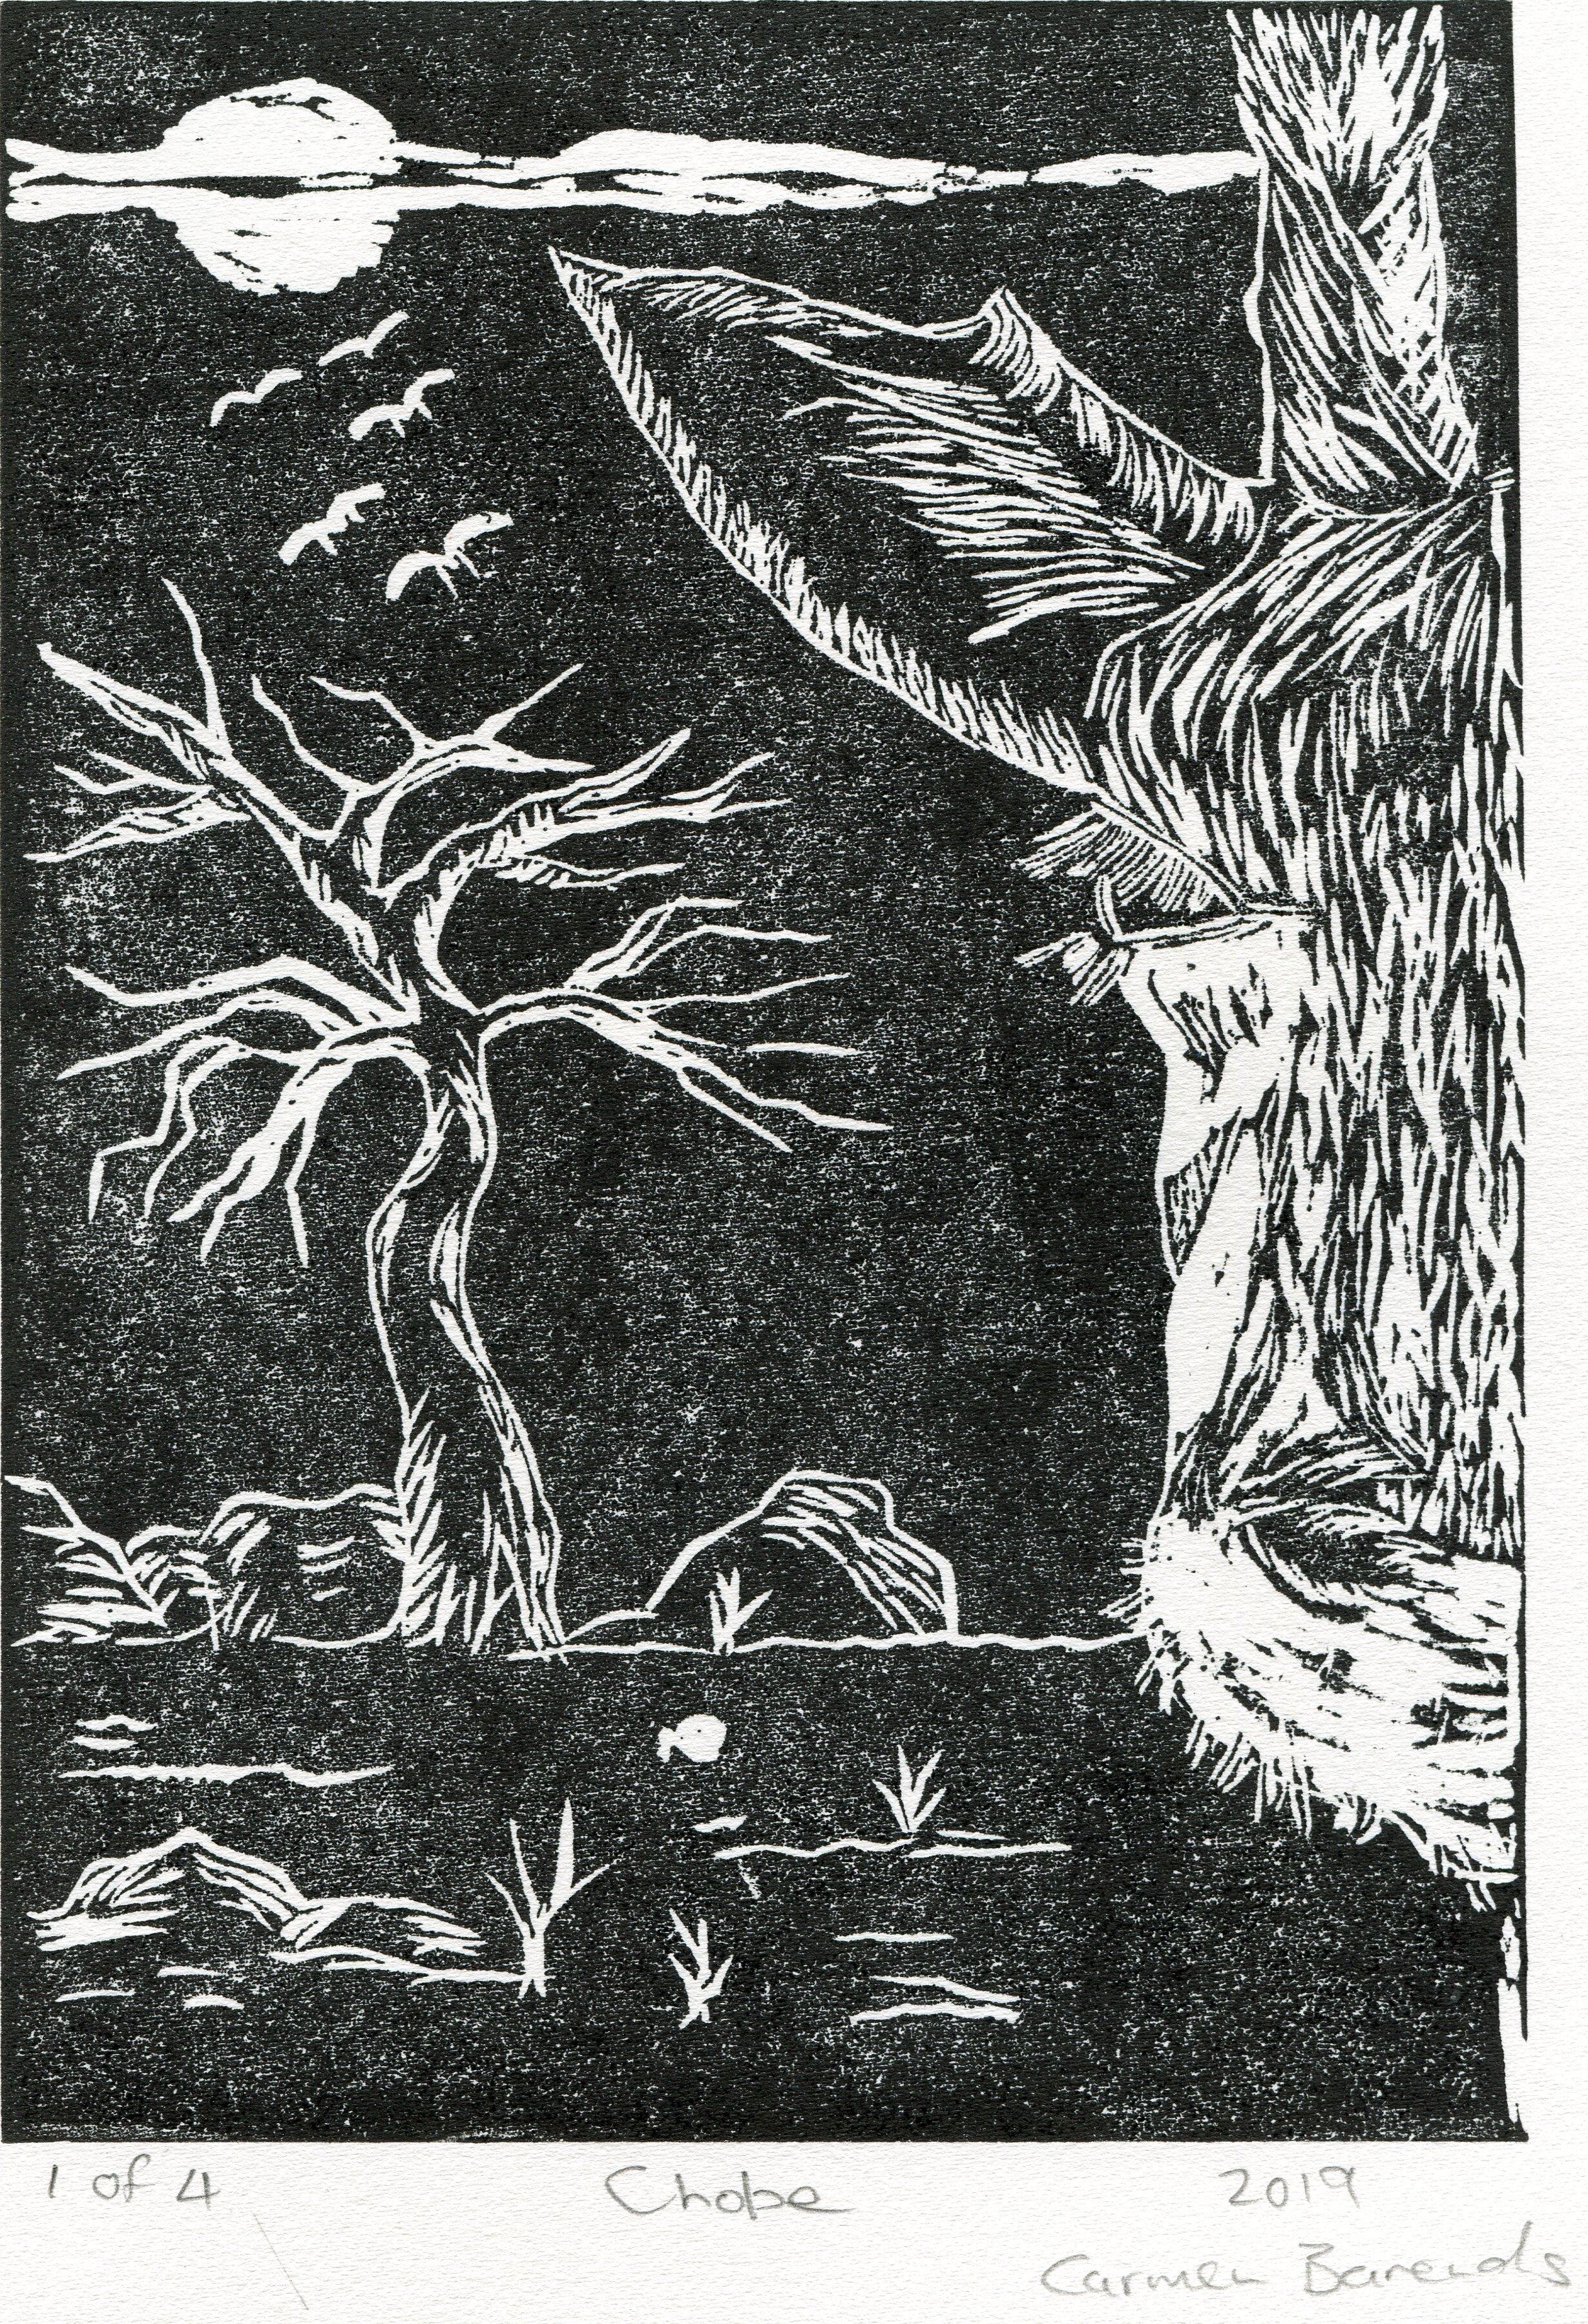 31a  Carmen Barends  Chobe  linocut print on paper